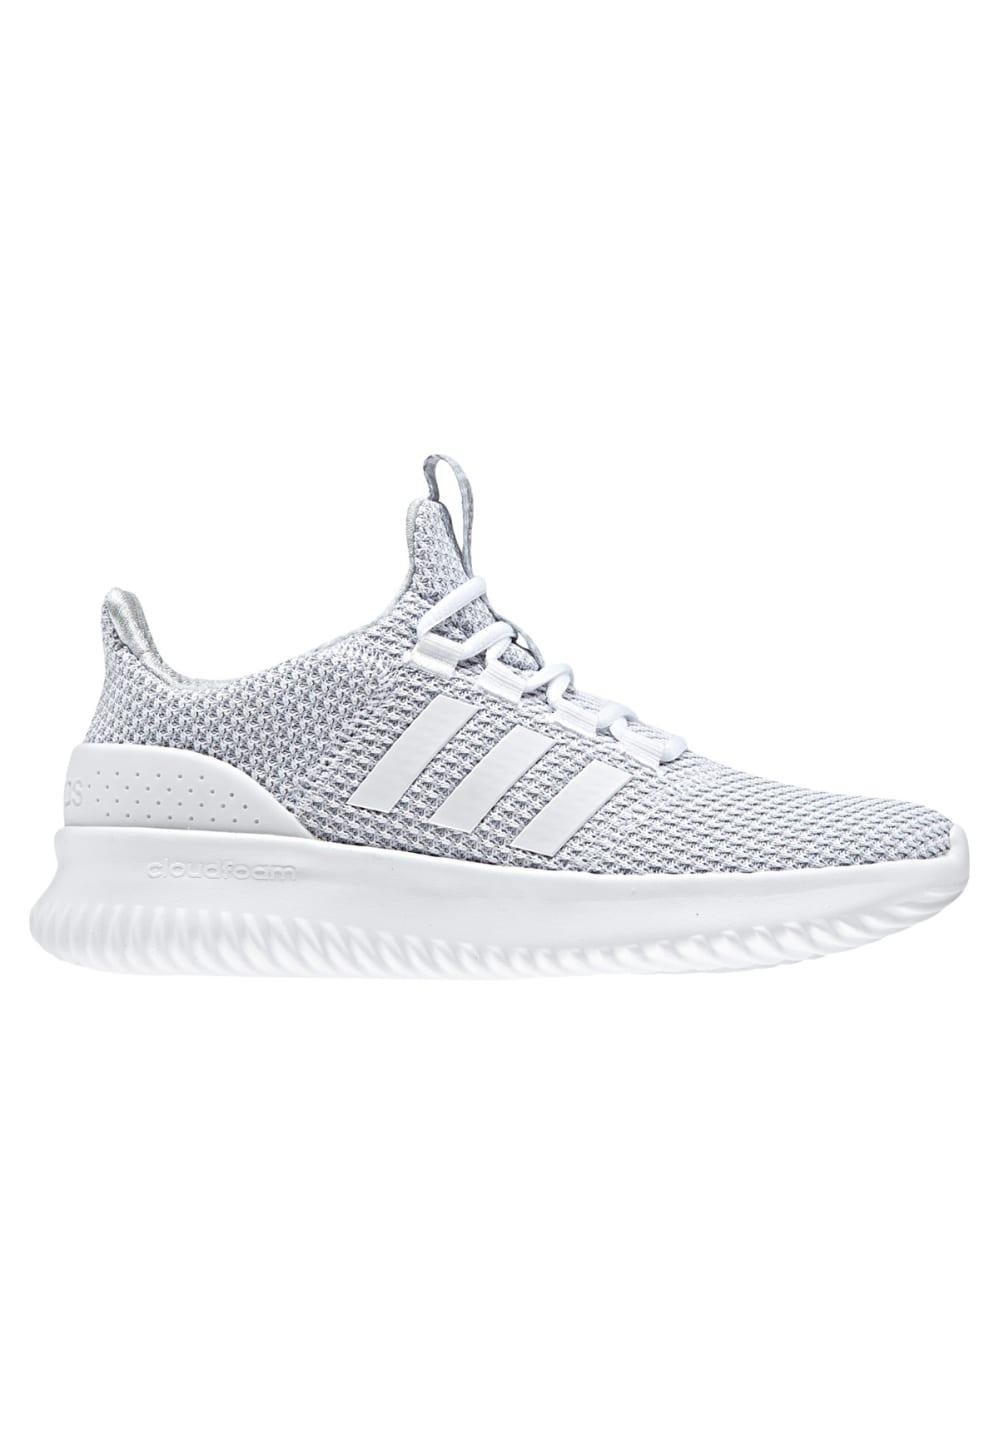 adidas neo Cloudfoam Ultimate - Sneaker - Weiß